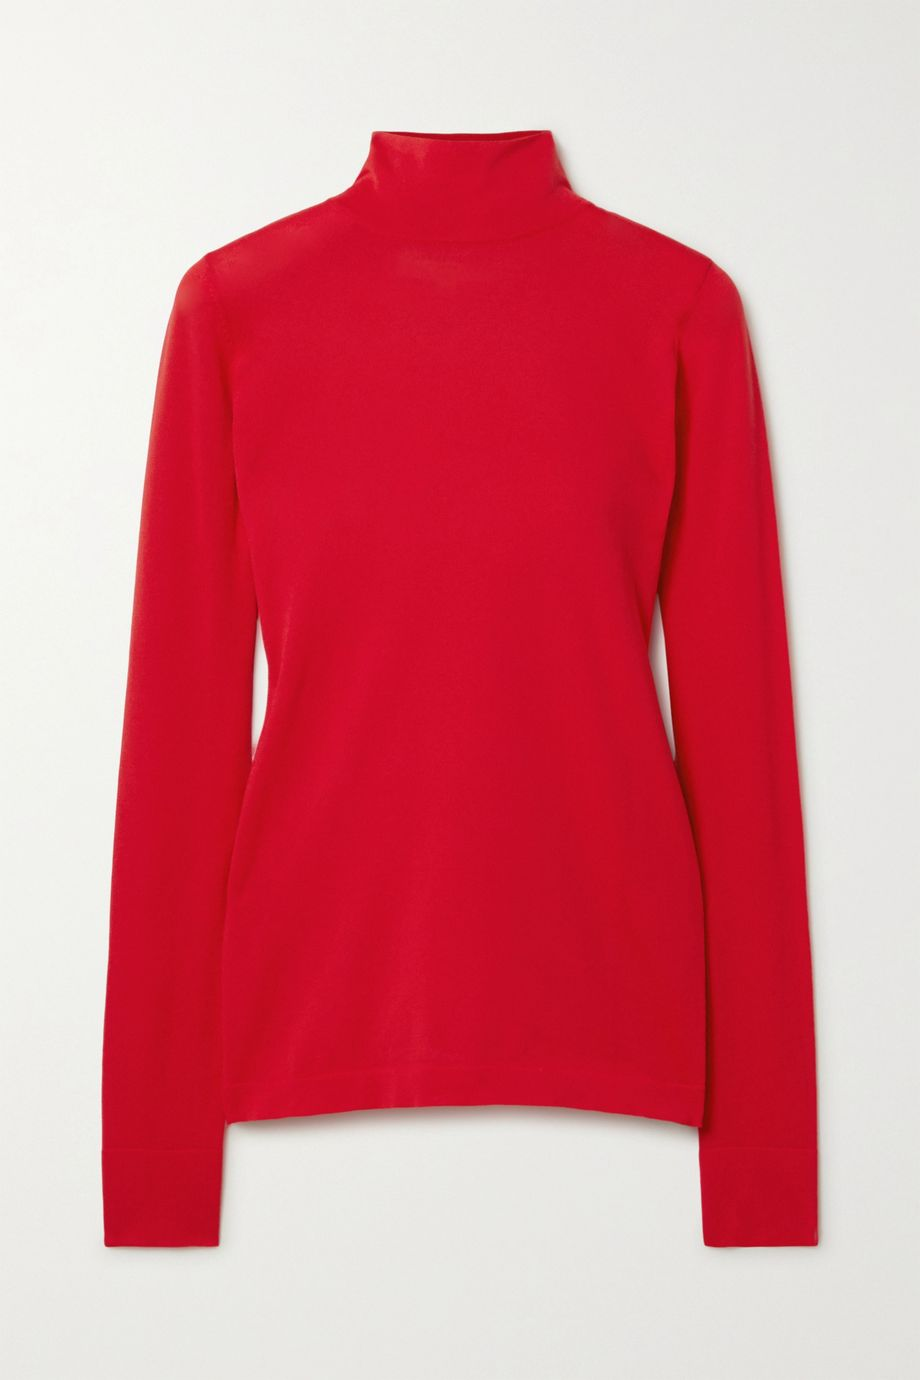 Les Rêveries Stretch-knit turtleneck top